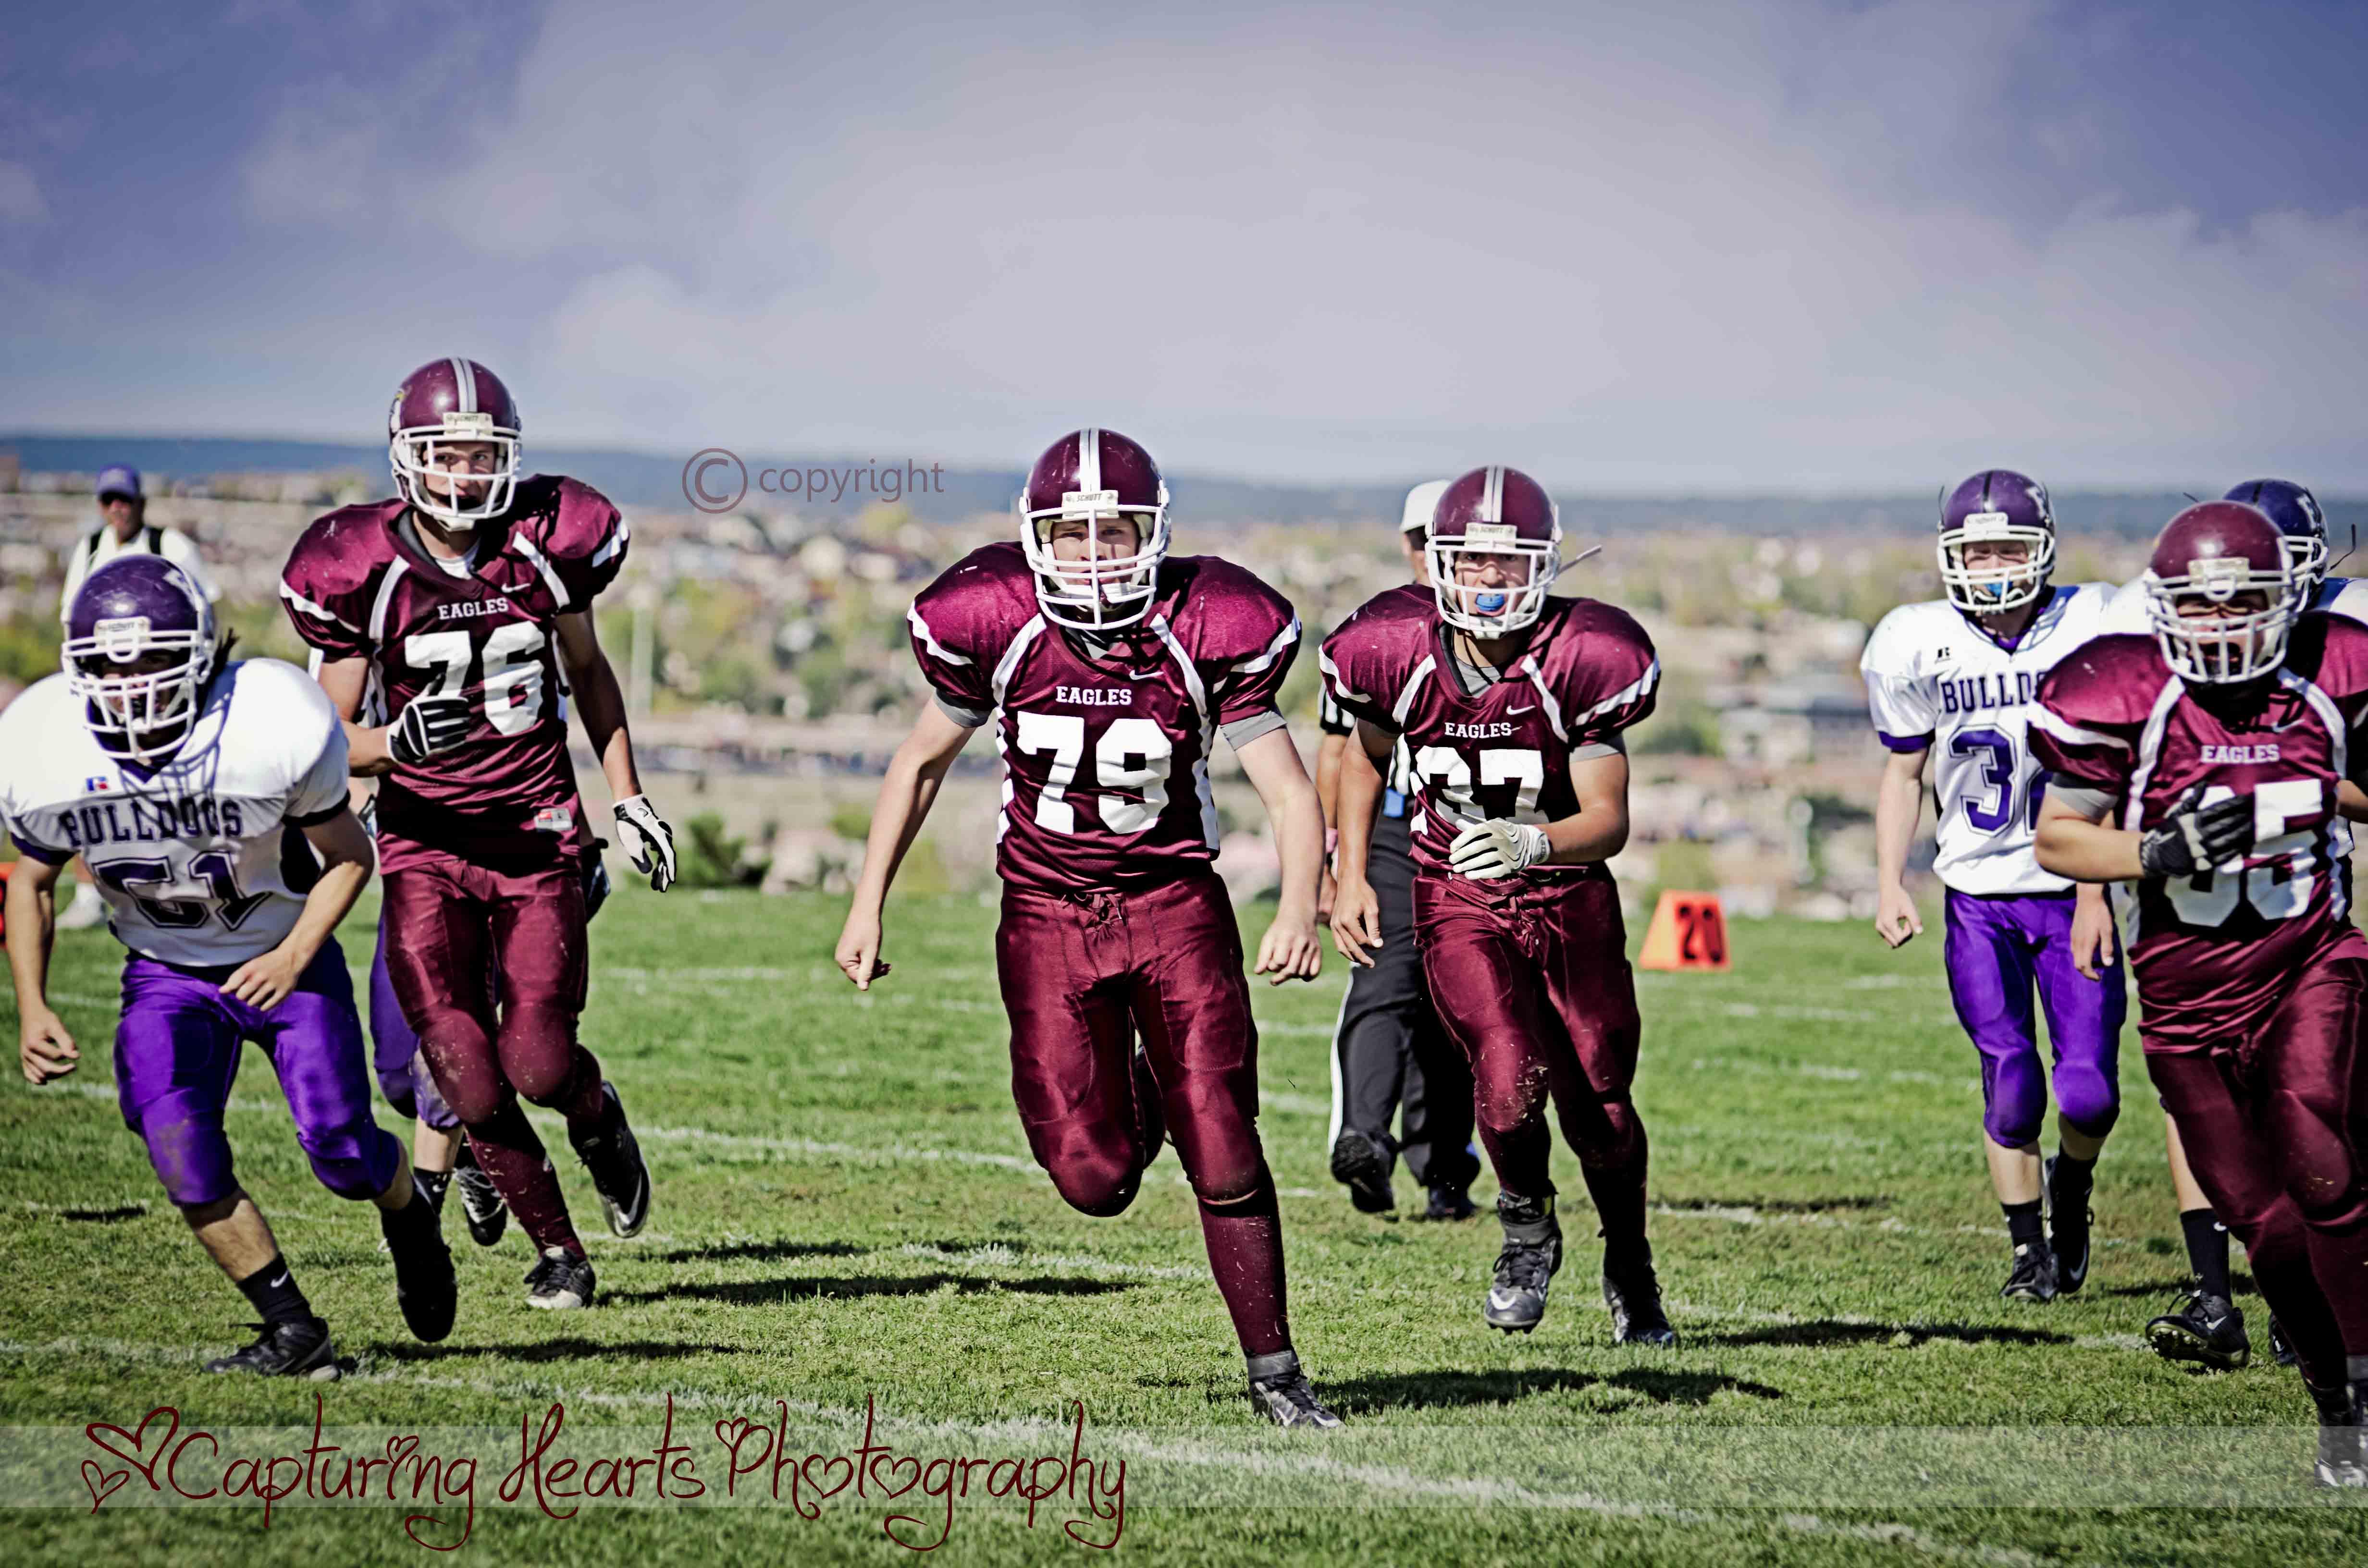 Football+Games+Colorado+Springs+Highschool+Senior+Sports+photographer+Copyright+LQ